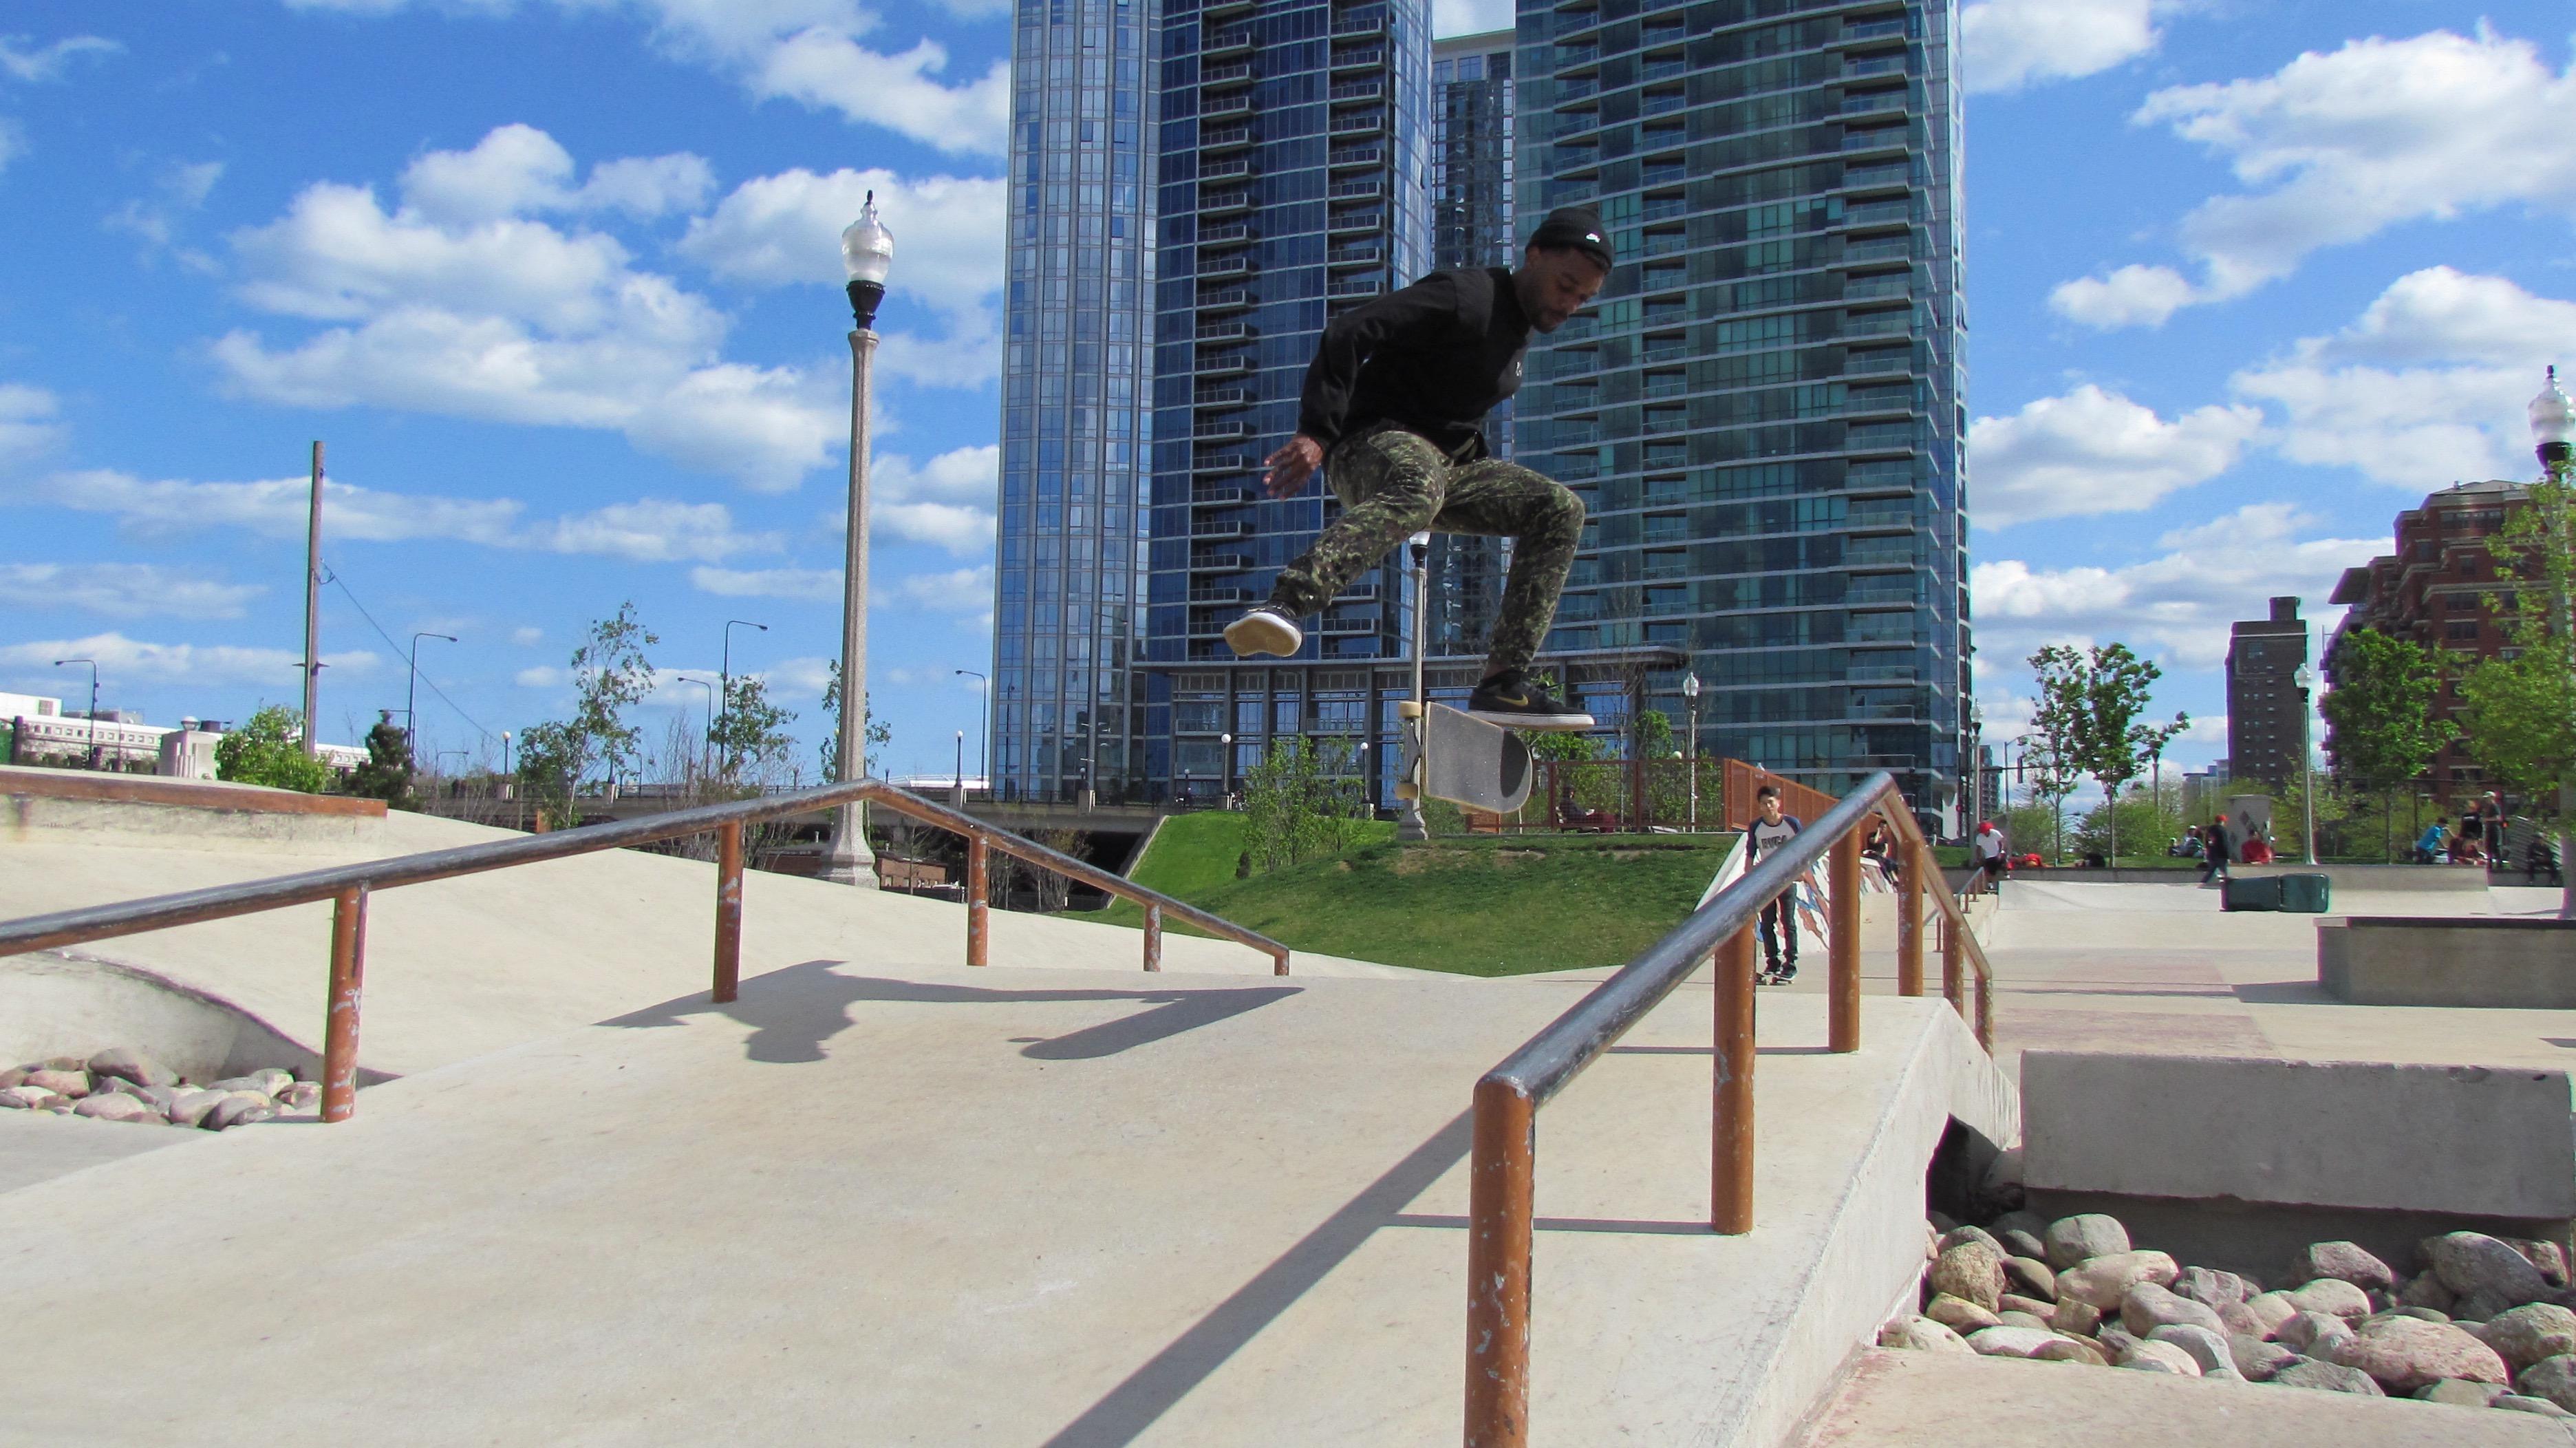 Grant Park Skate Park - 5